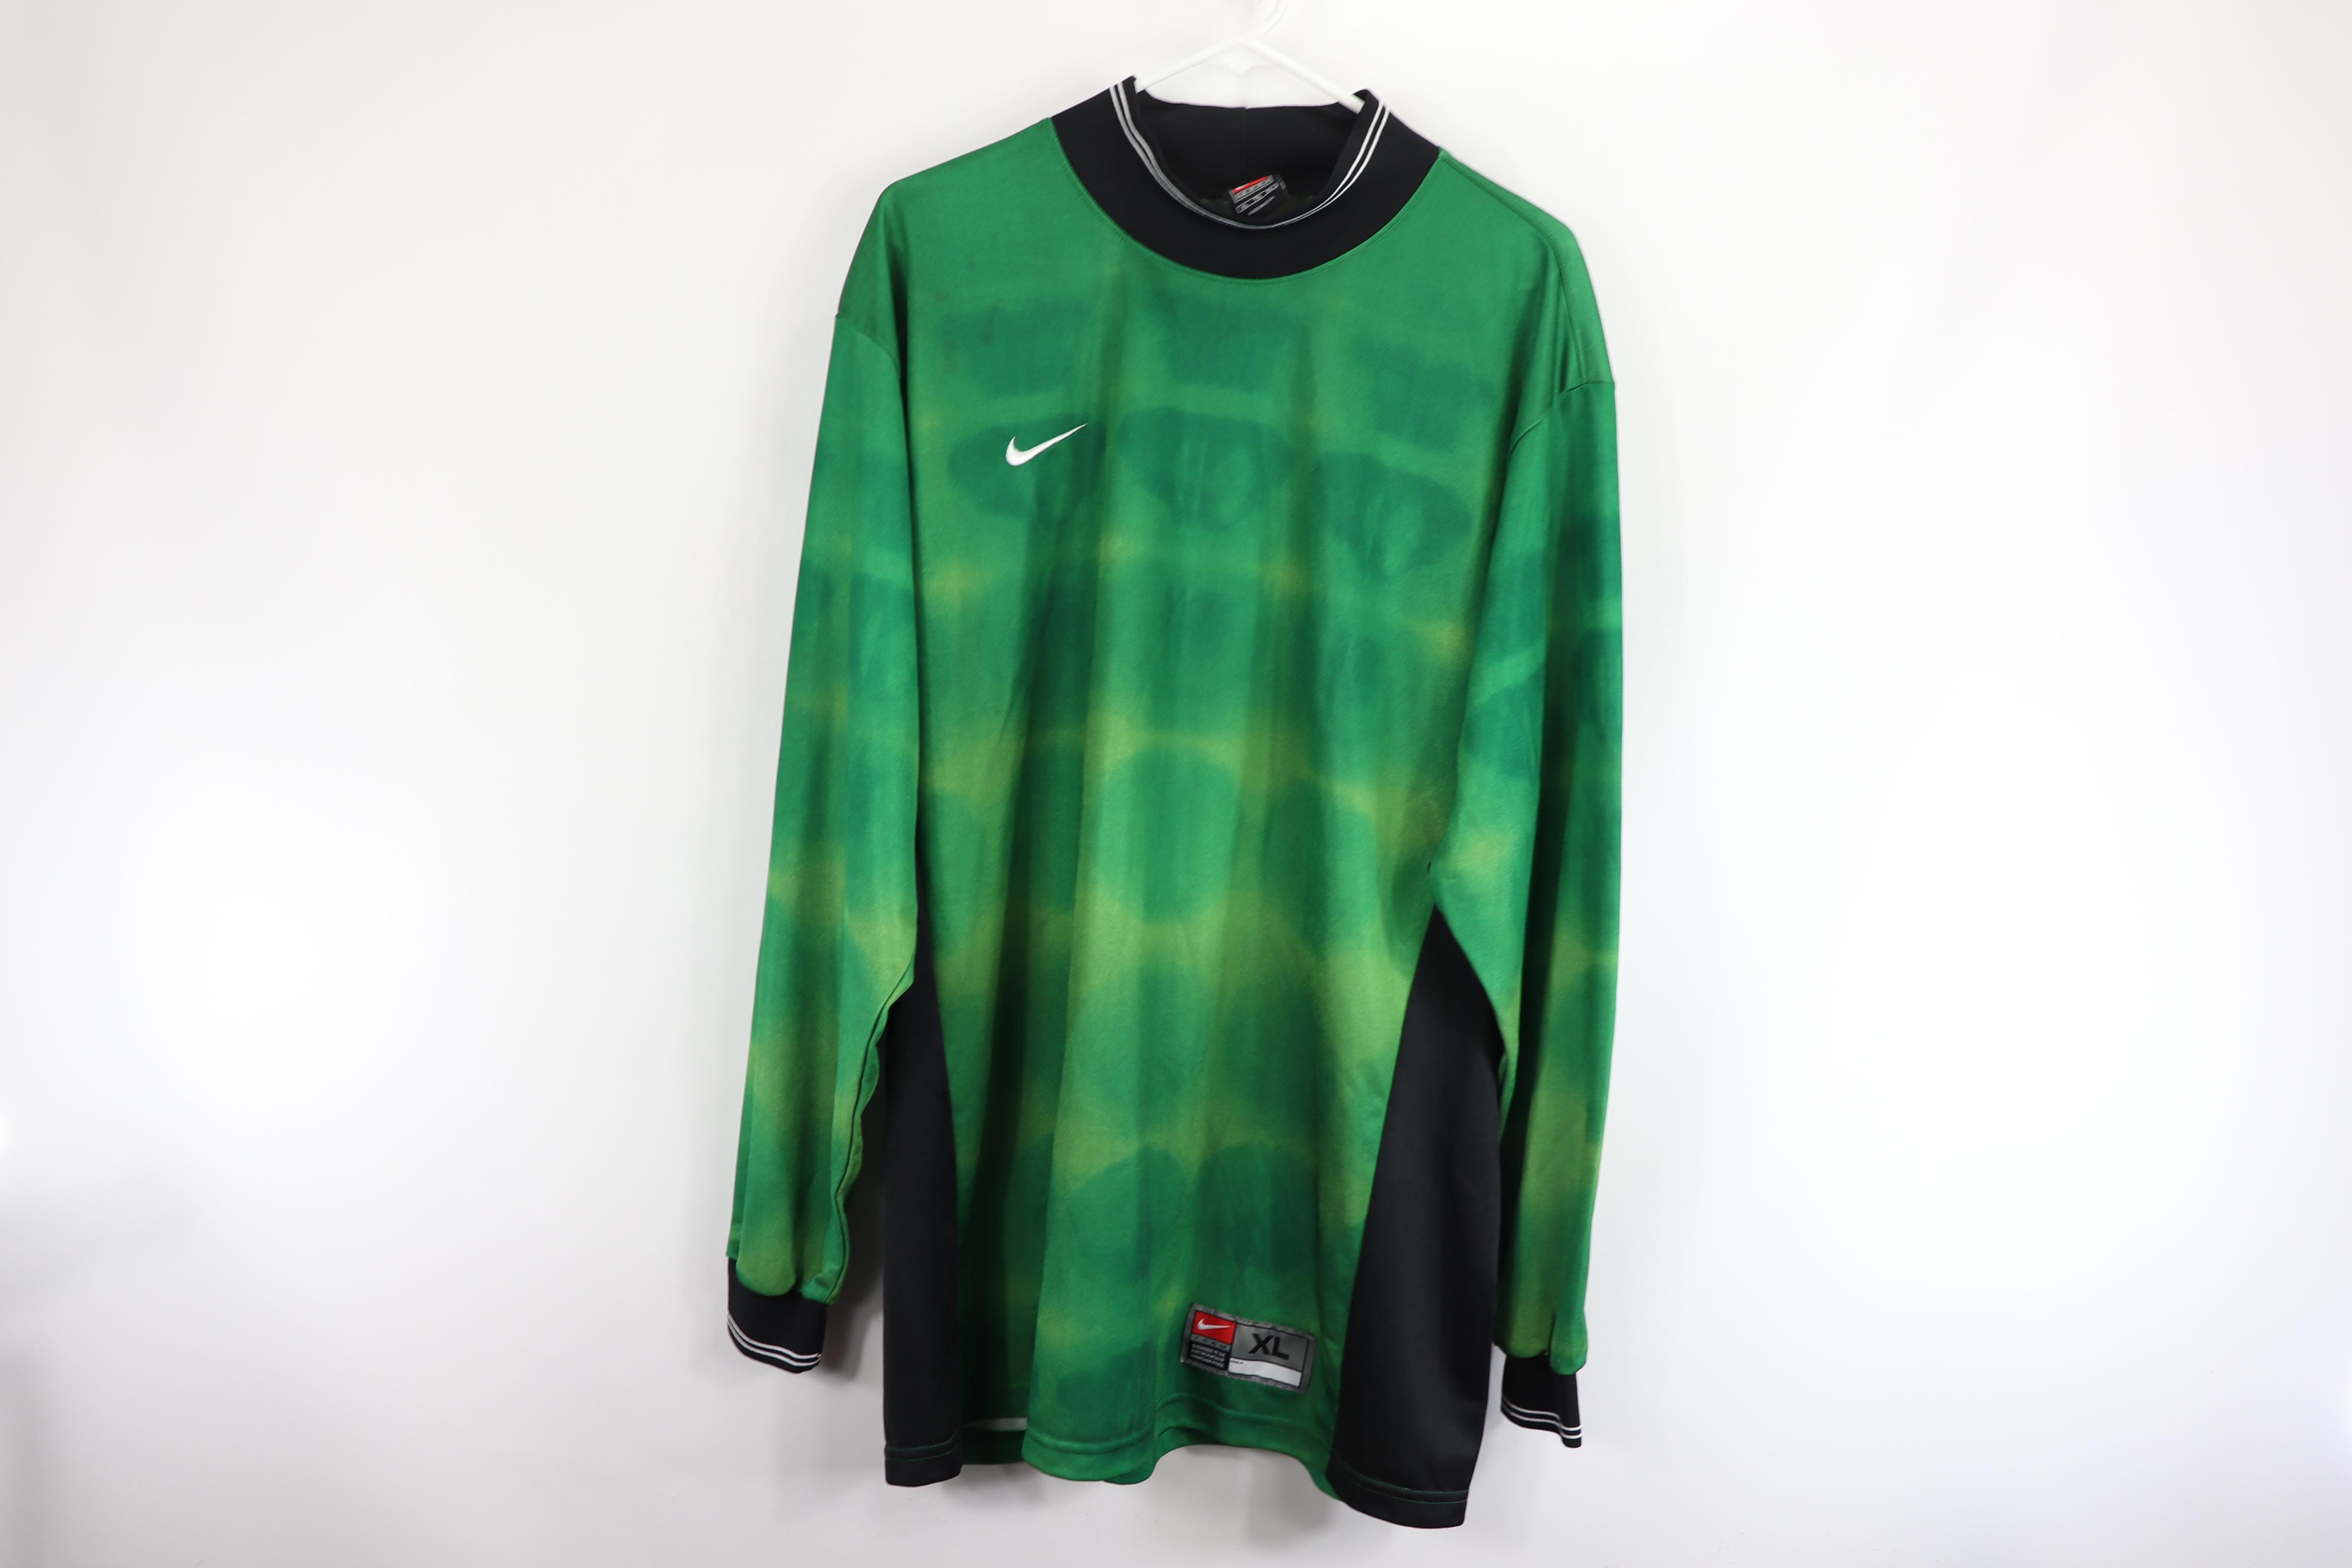 45259cac55a Nike × Vintage. Vintage 90s Nike Mens XL Long Sleeve Soccer Goalkeeper  Goalie Jersey Green